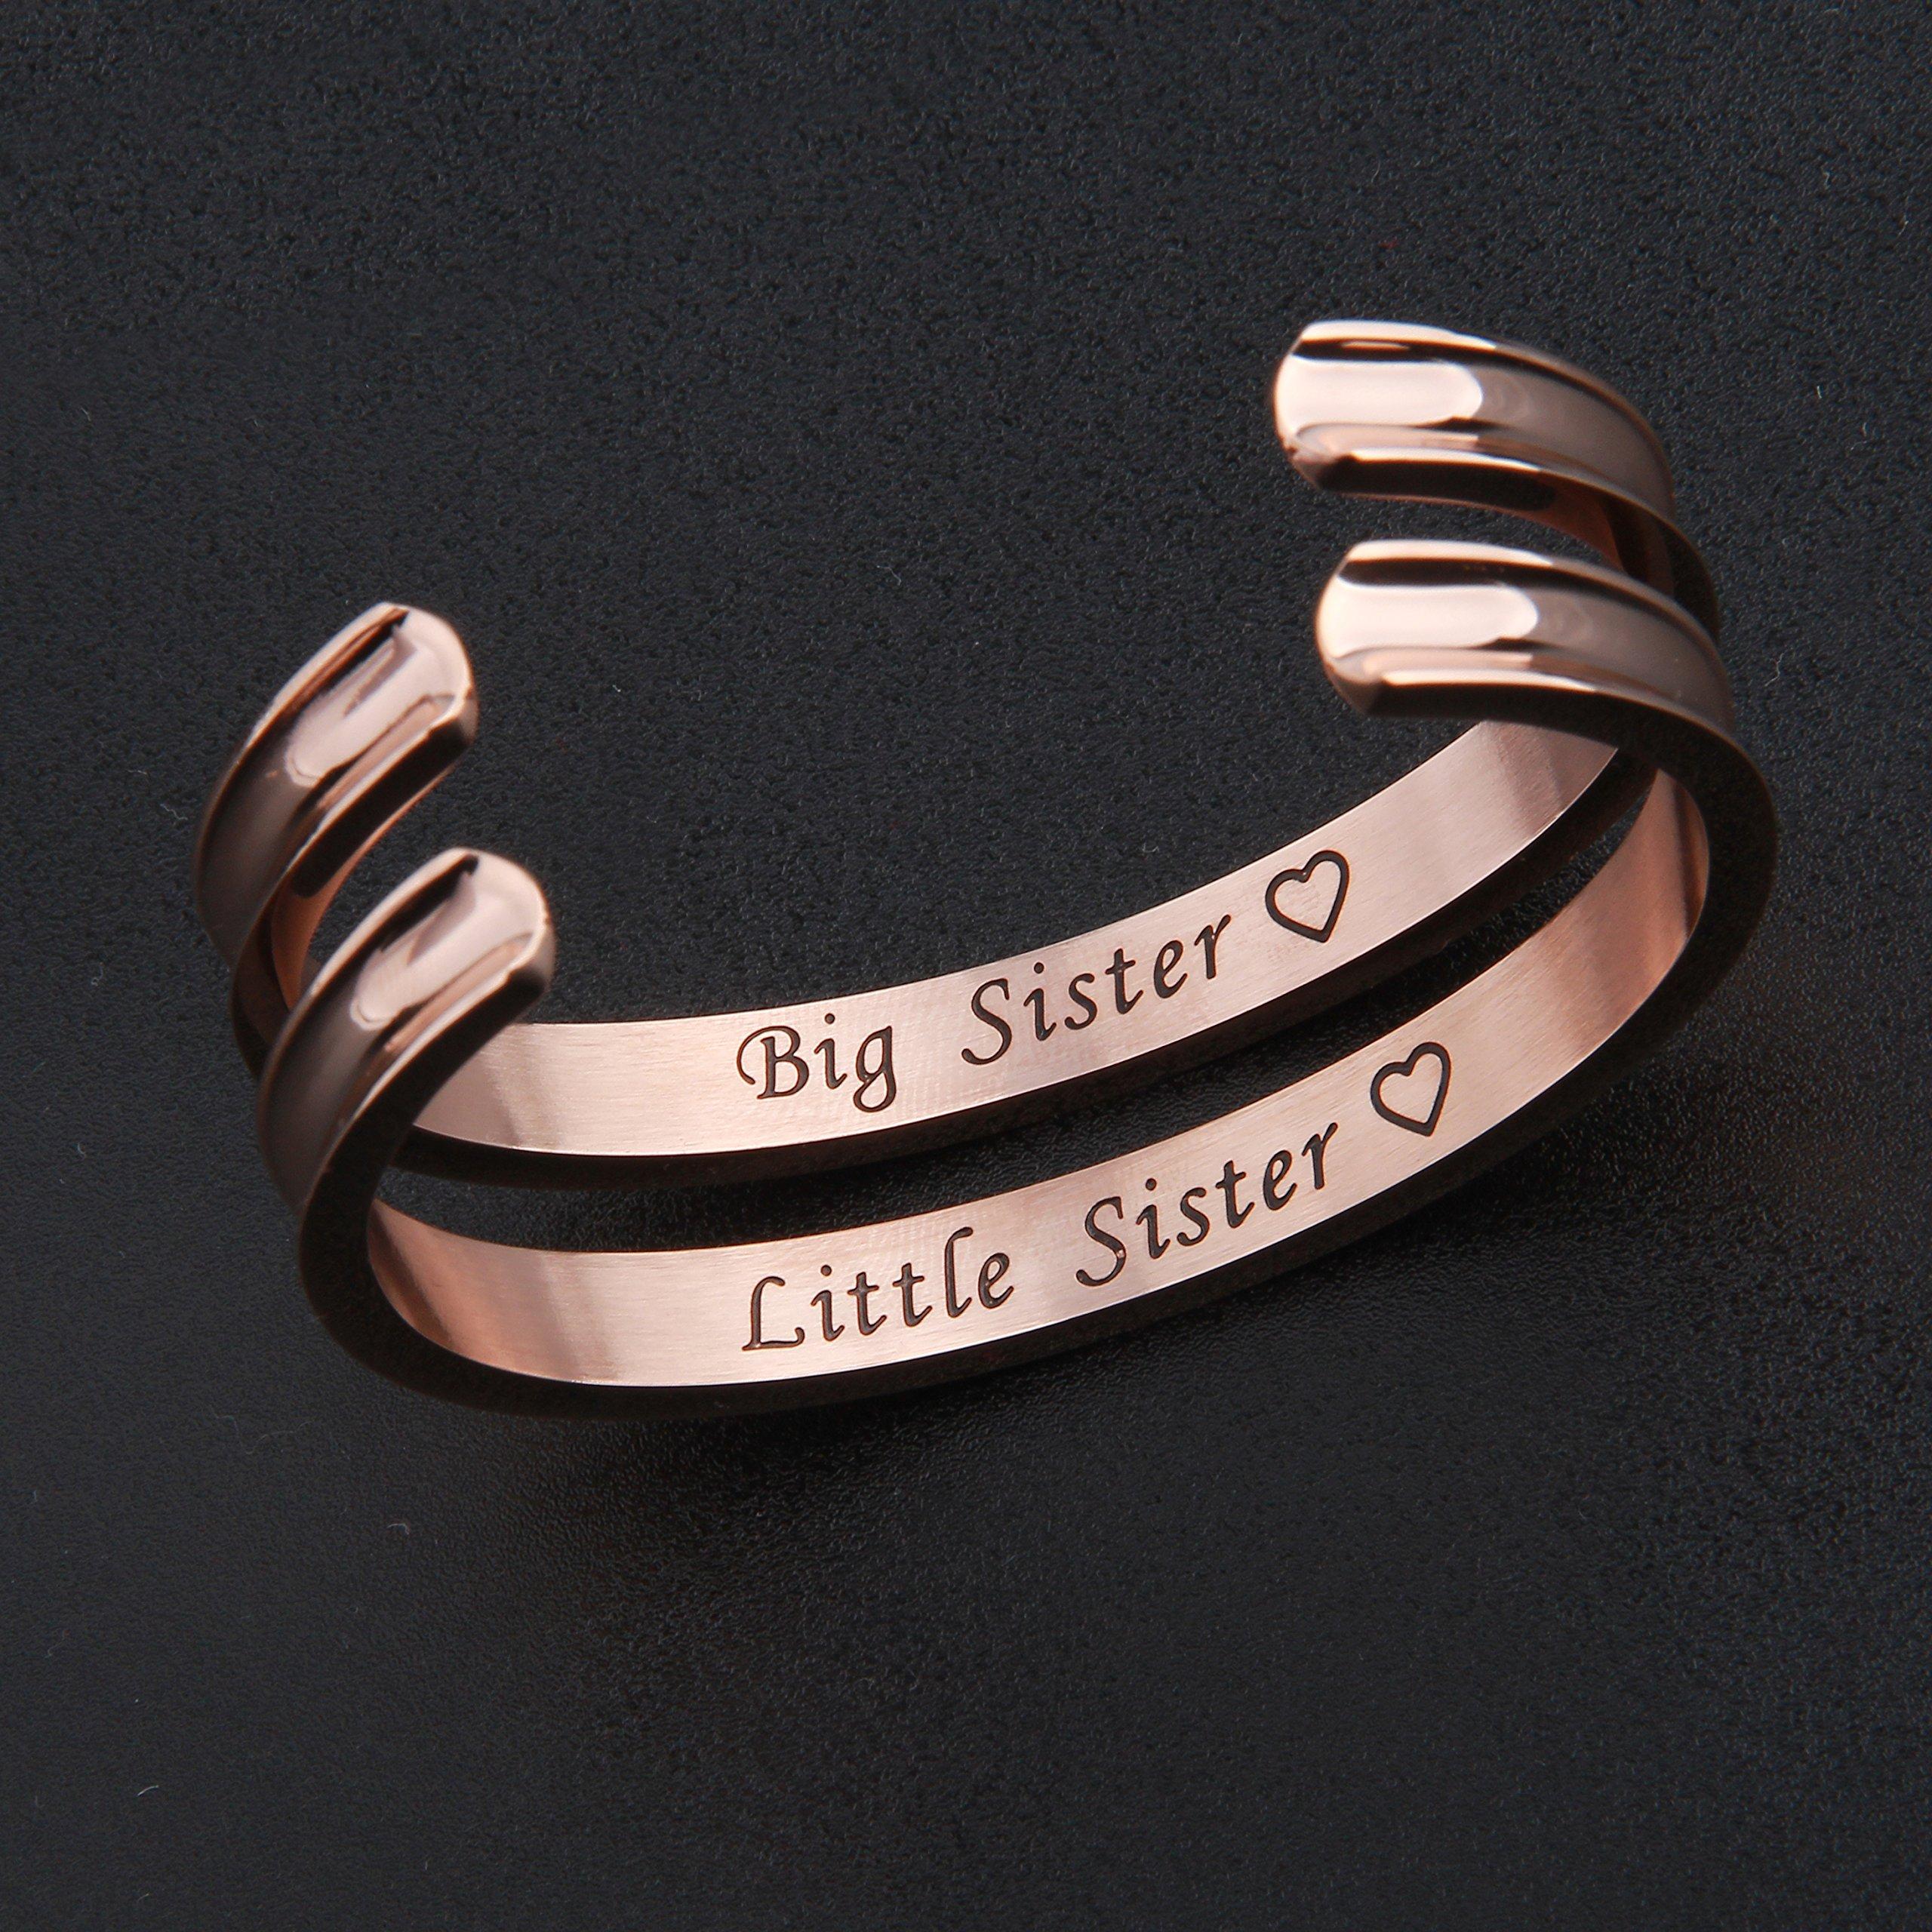 Zuo Bao Big Sister Little Sister Bracelet Hair Tie Bracelet Stainless Steel Cuff Bangle Beacelet (Rose Gold-2 Pcs) by Zuo Bao (Image #2)